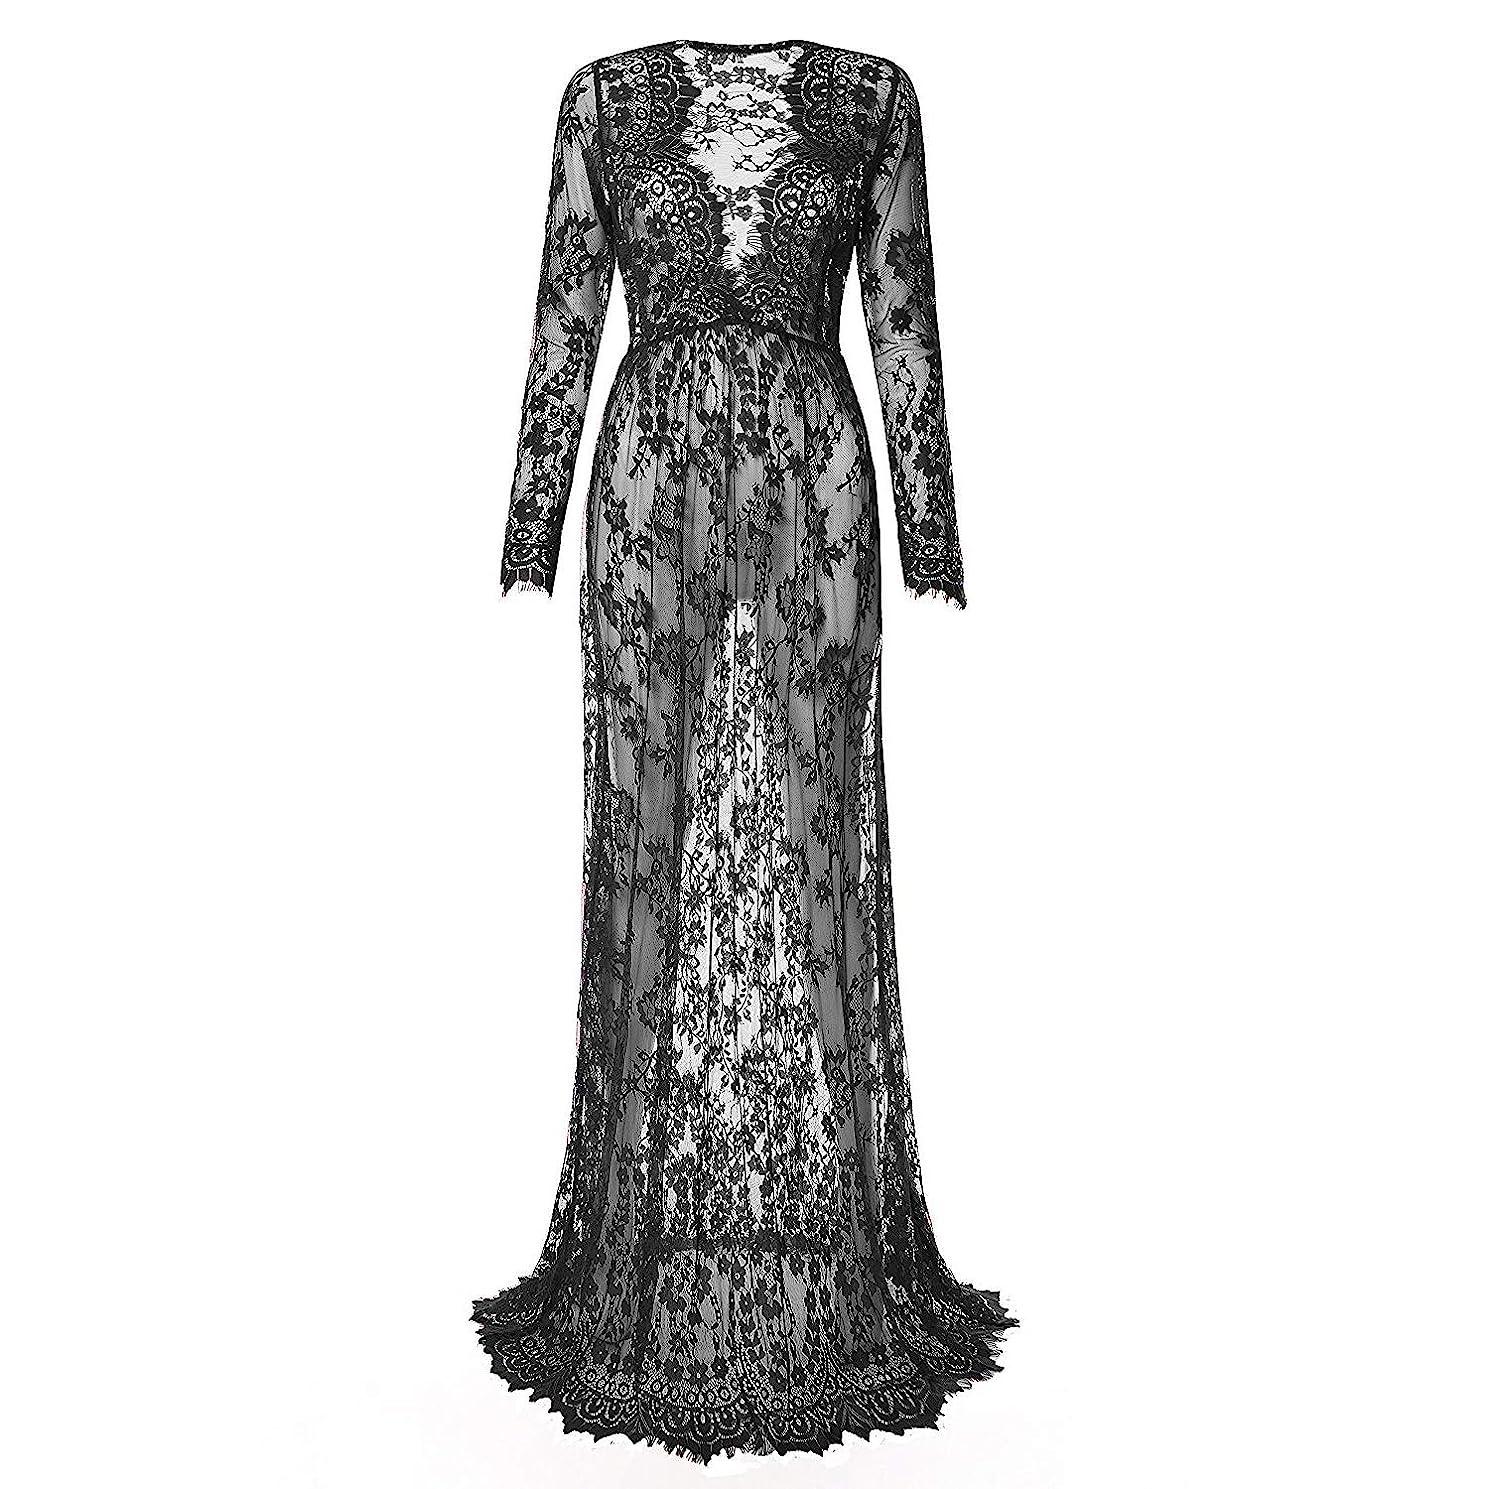 Laisiyi Sexy Deep V-Neck Lace Beach Dress See-Through Long Sleeve Maxi Dress